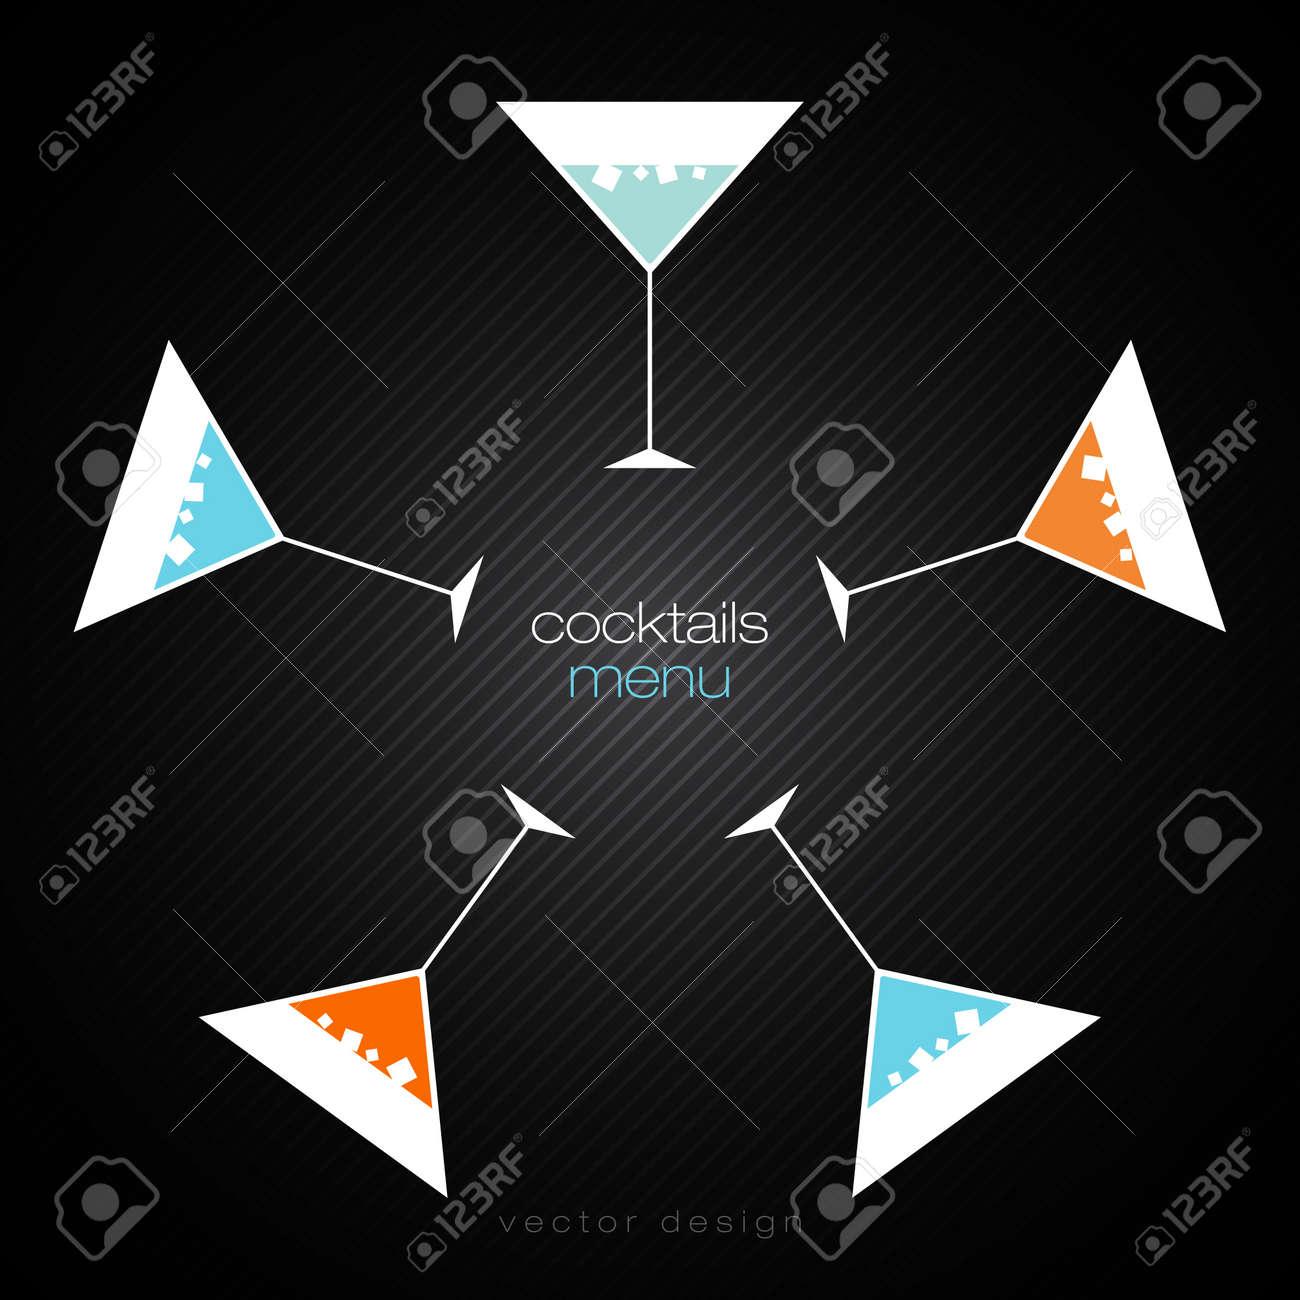 Cocktails Menu Card Design Template Stock Vector - 14422074